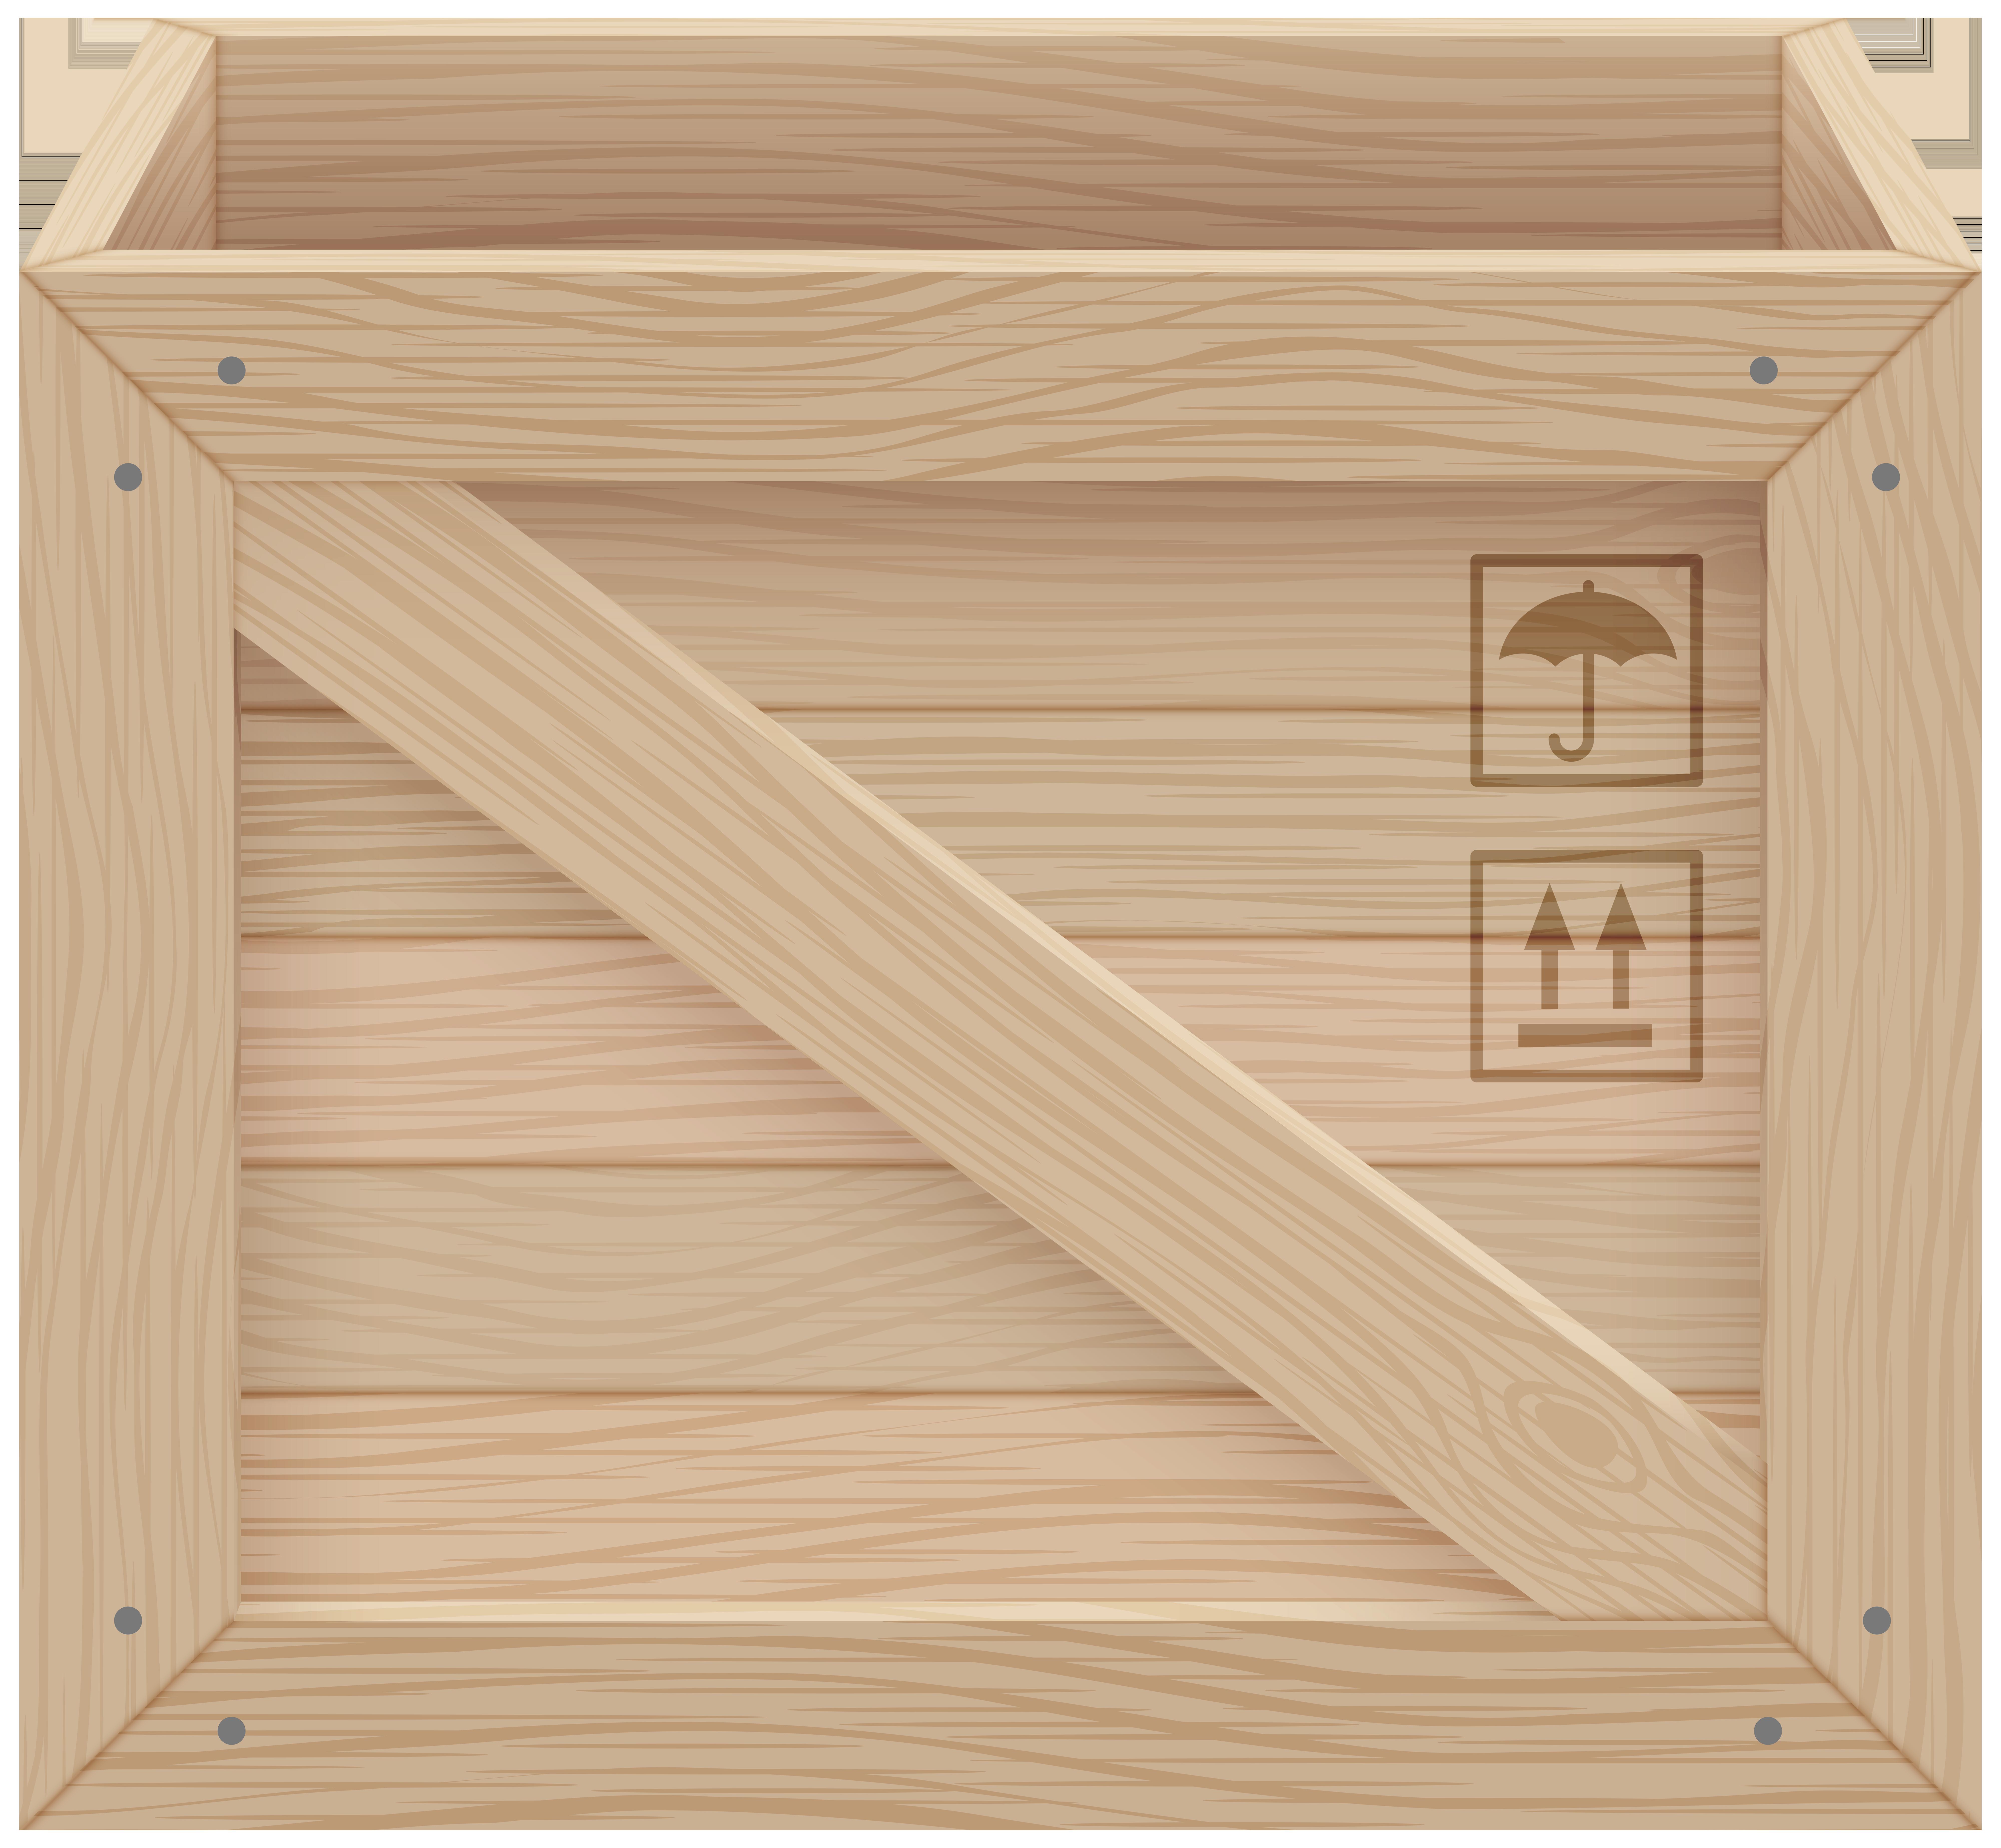 Wooden Crate PNG Clip Art.